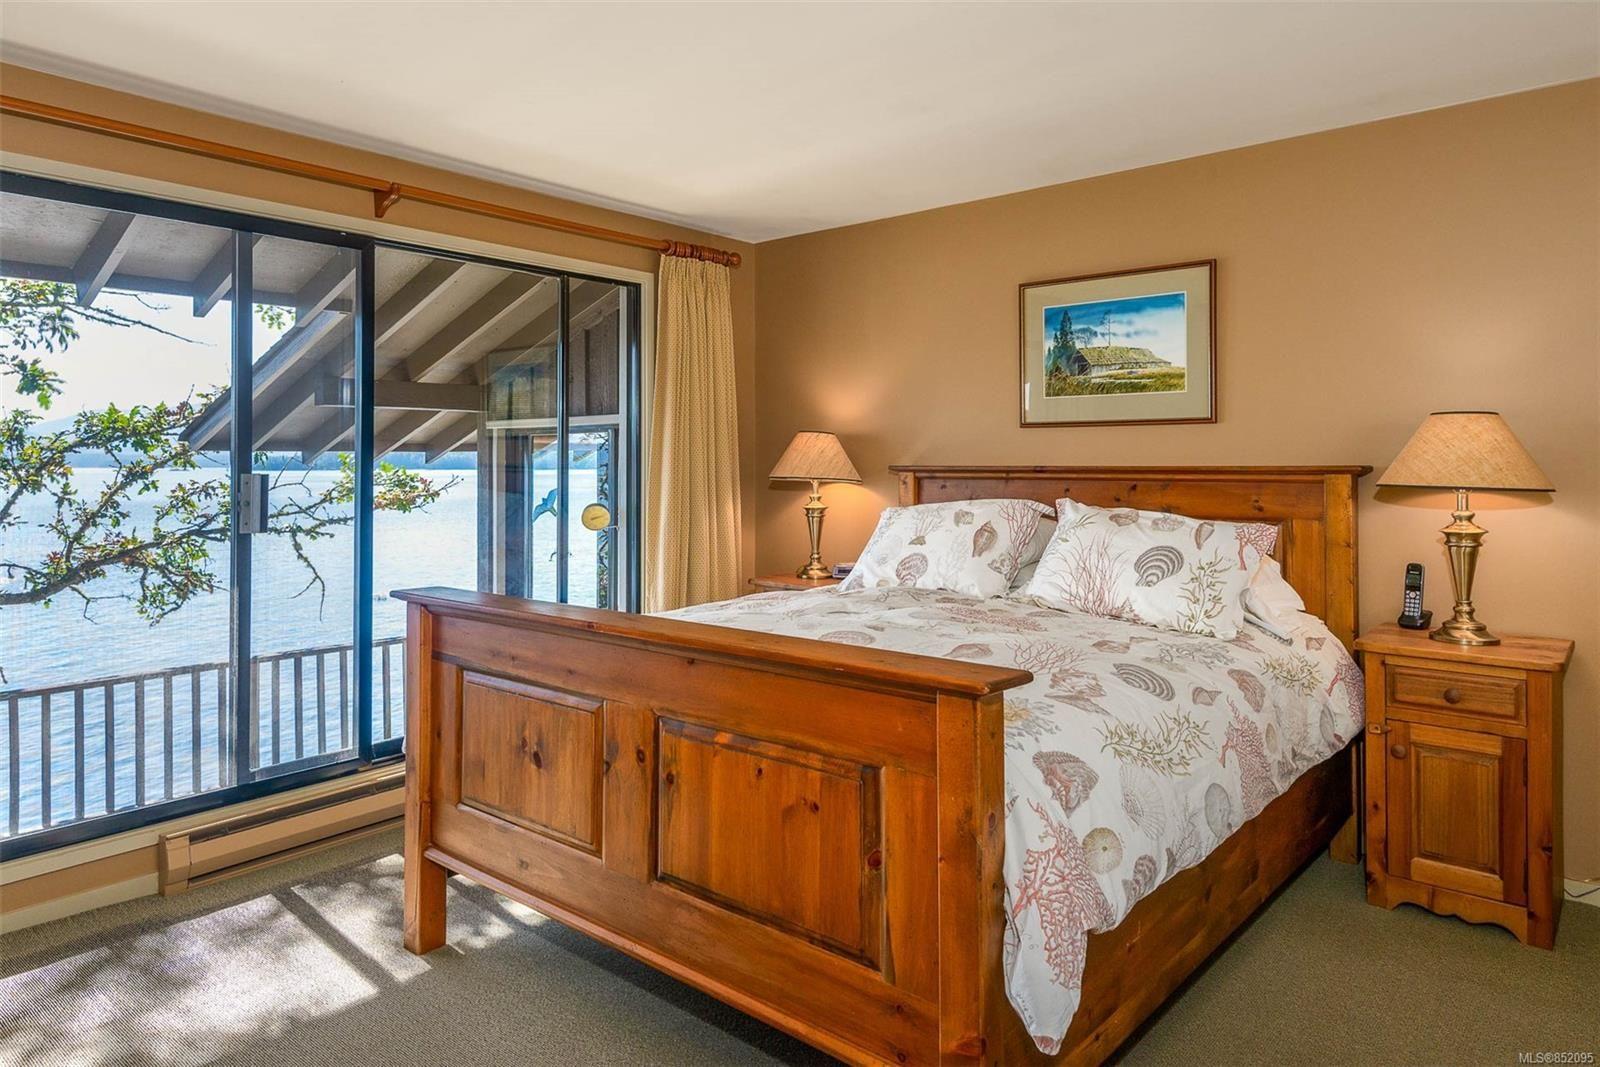 Photo 12: Photos: 236 McGill Rd in : GI Salt Spring House for sale (Gulf Islands)  : MLS®# 852095